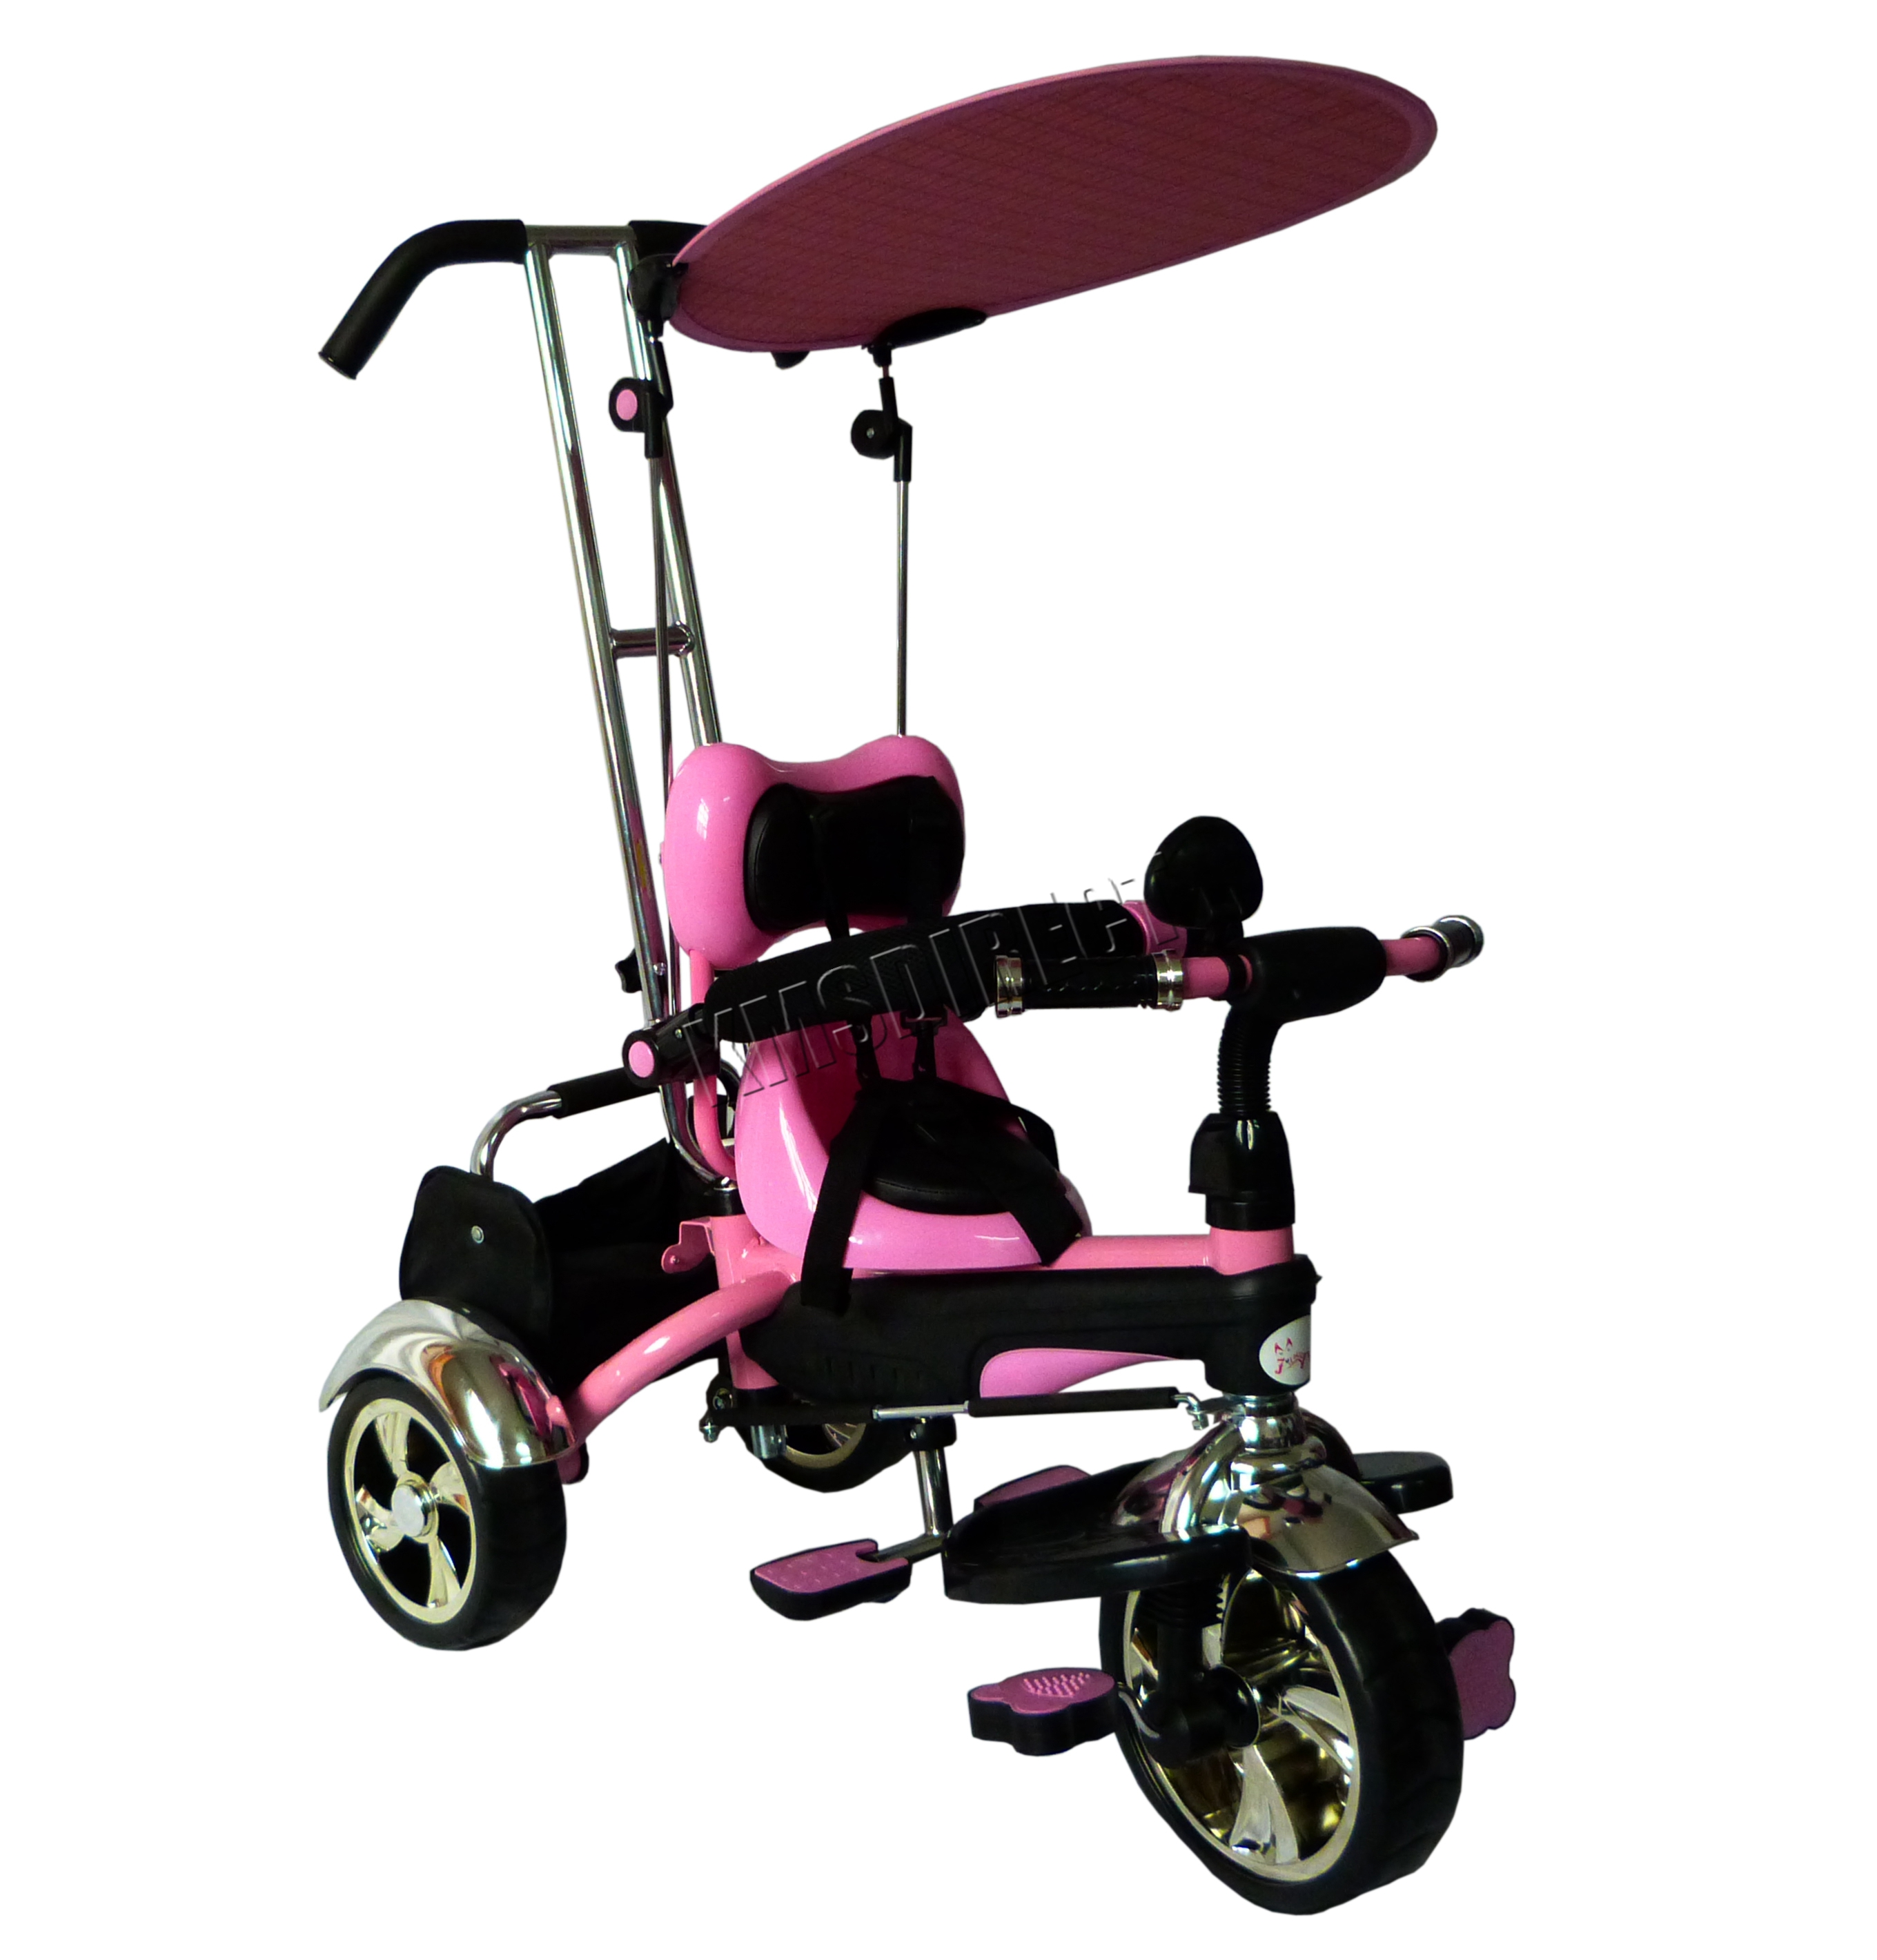 foxhunter 4in1 kids children trike tricycle 3 wheel ride. Black Bedroom Furniture Sets. Home Design Ideas